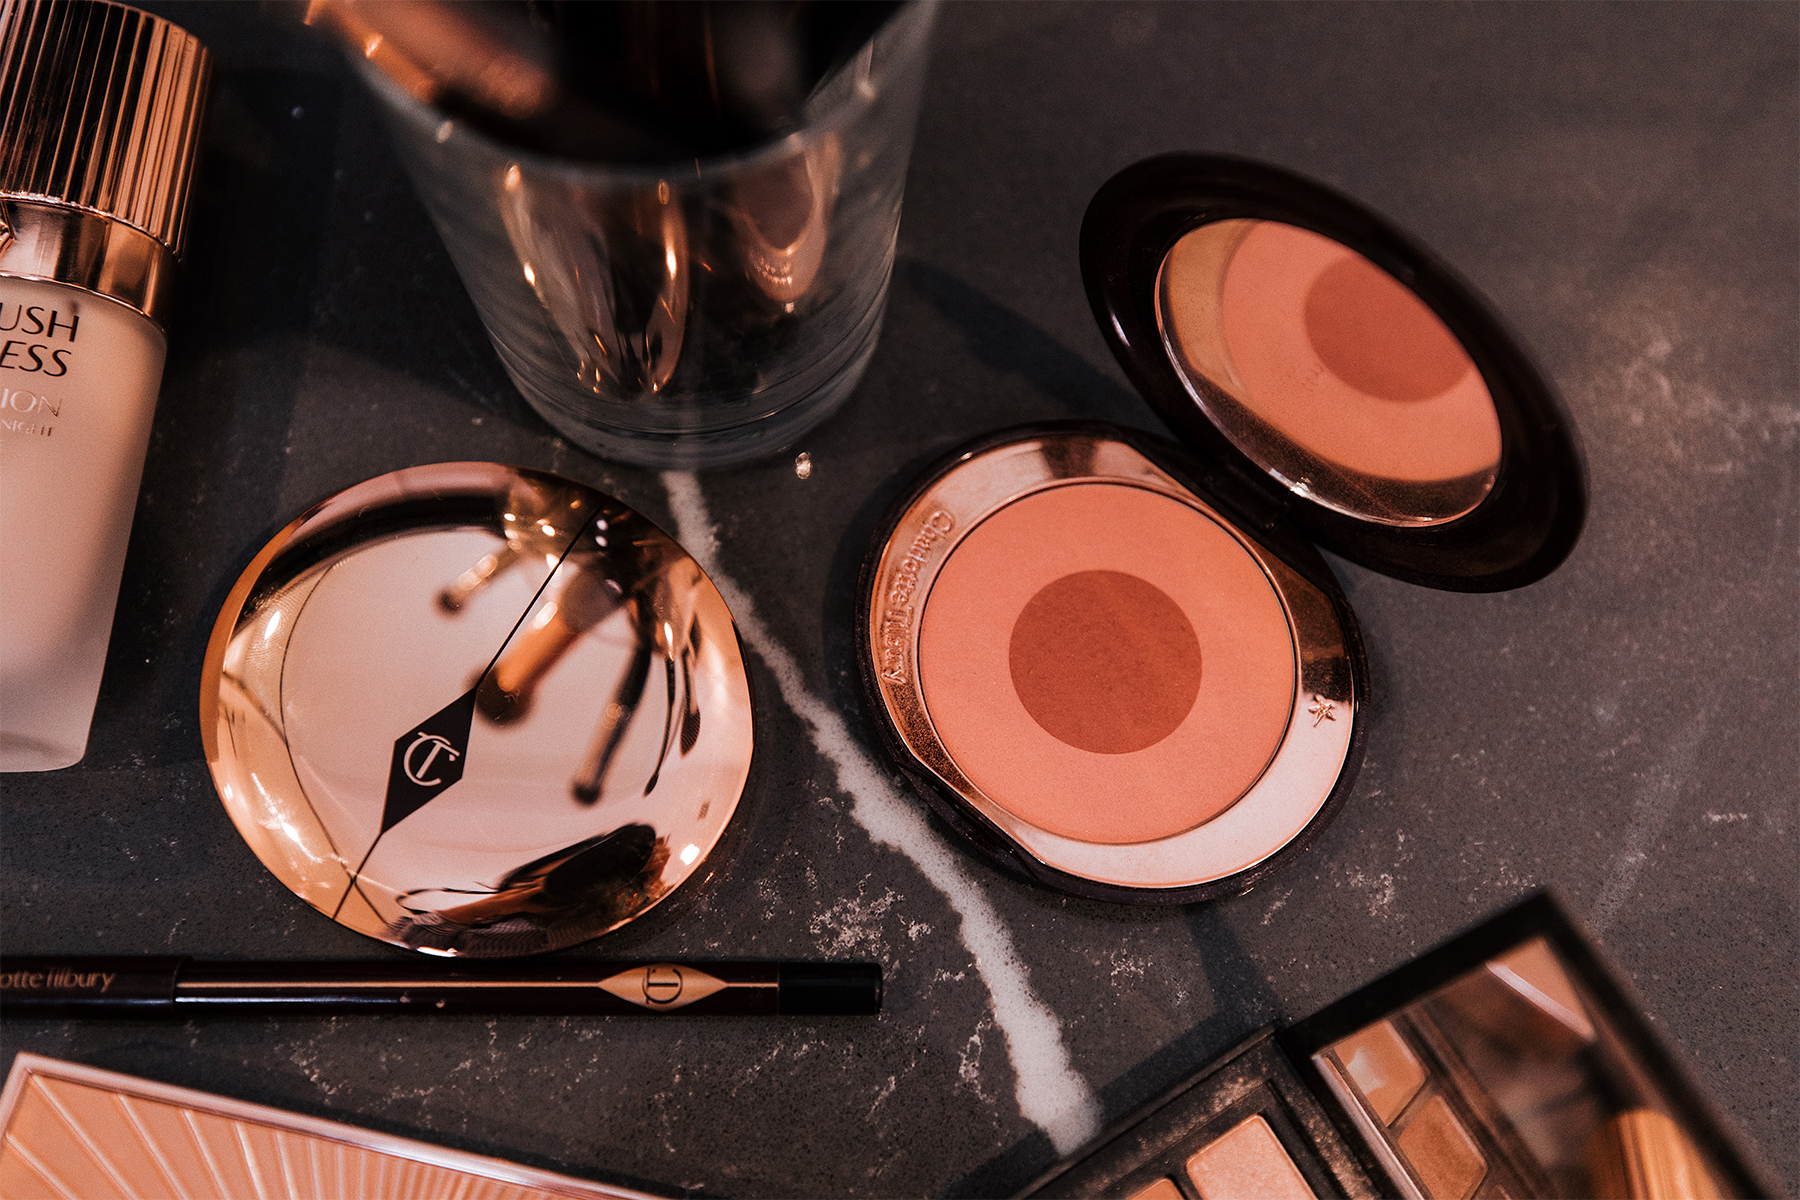 fashion jackson sephora holiday beauty event 2019 charlotte tilbury makeup powder blush